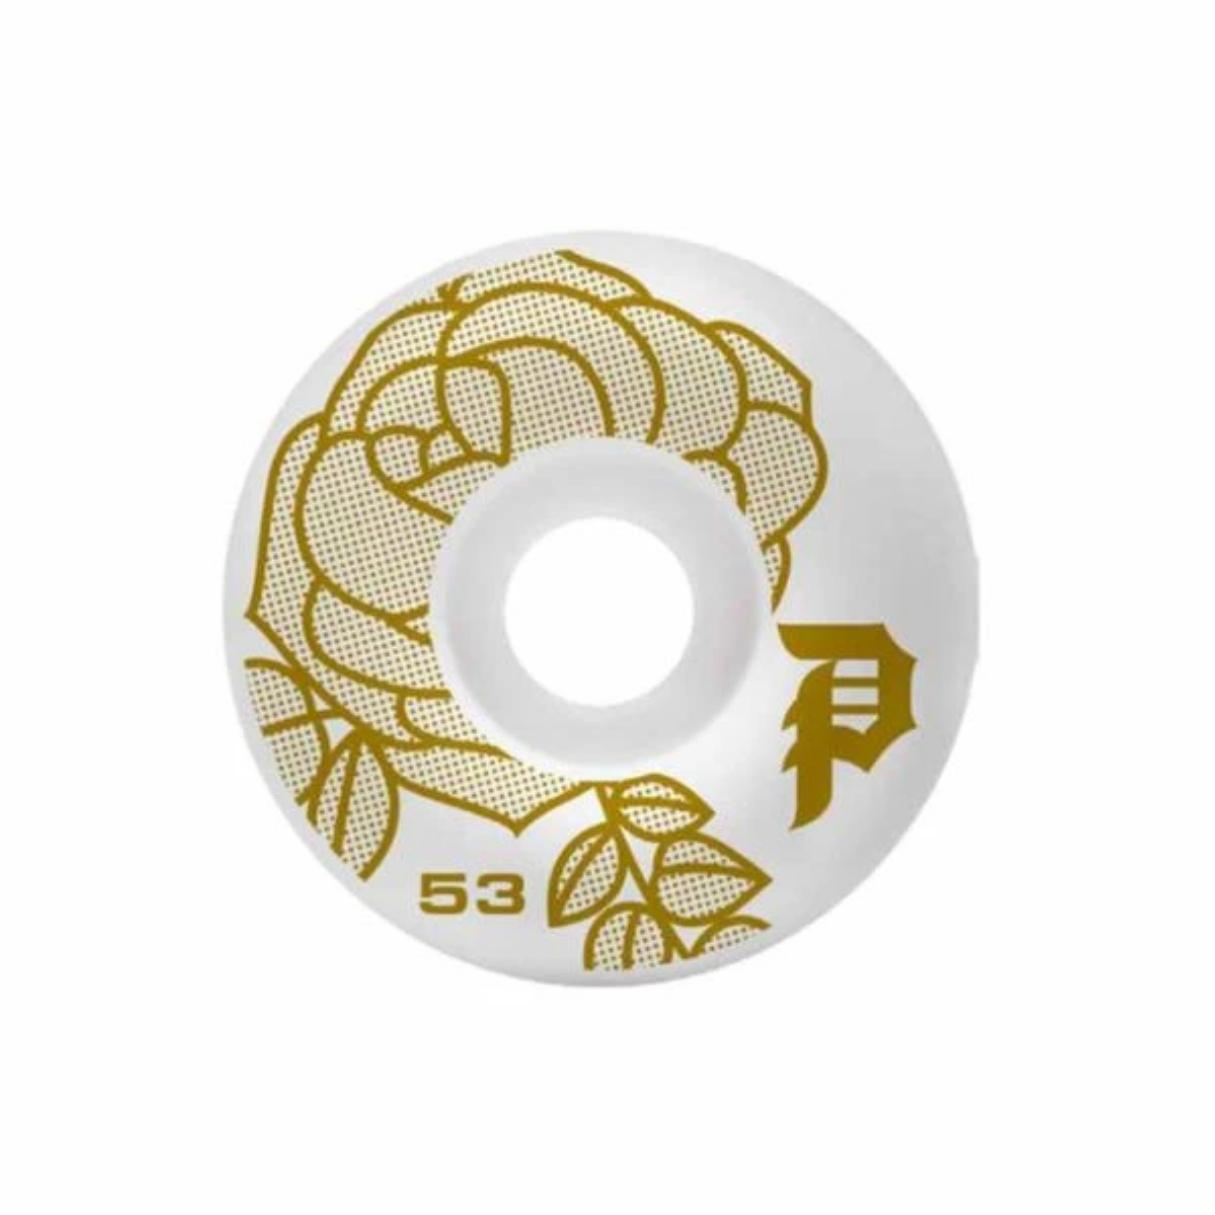 Primitive Rosa Team Wheel Gold 53mm